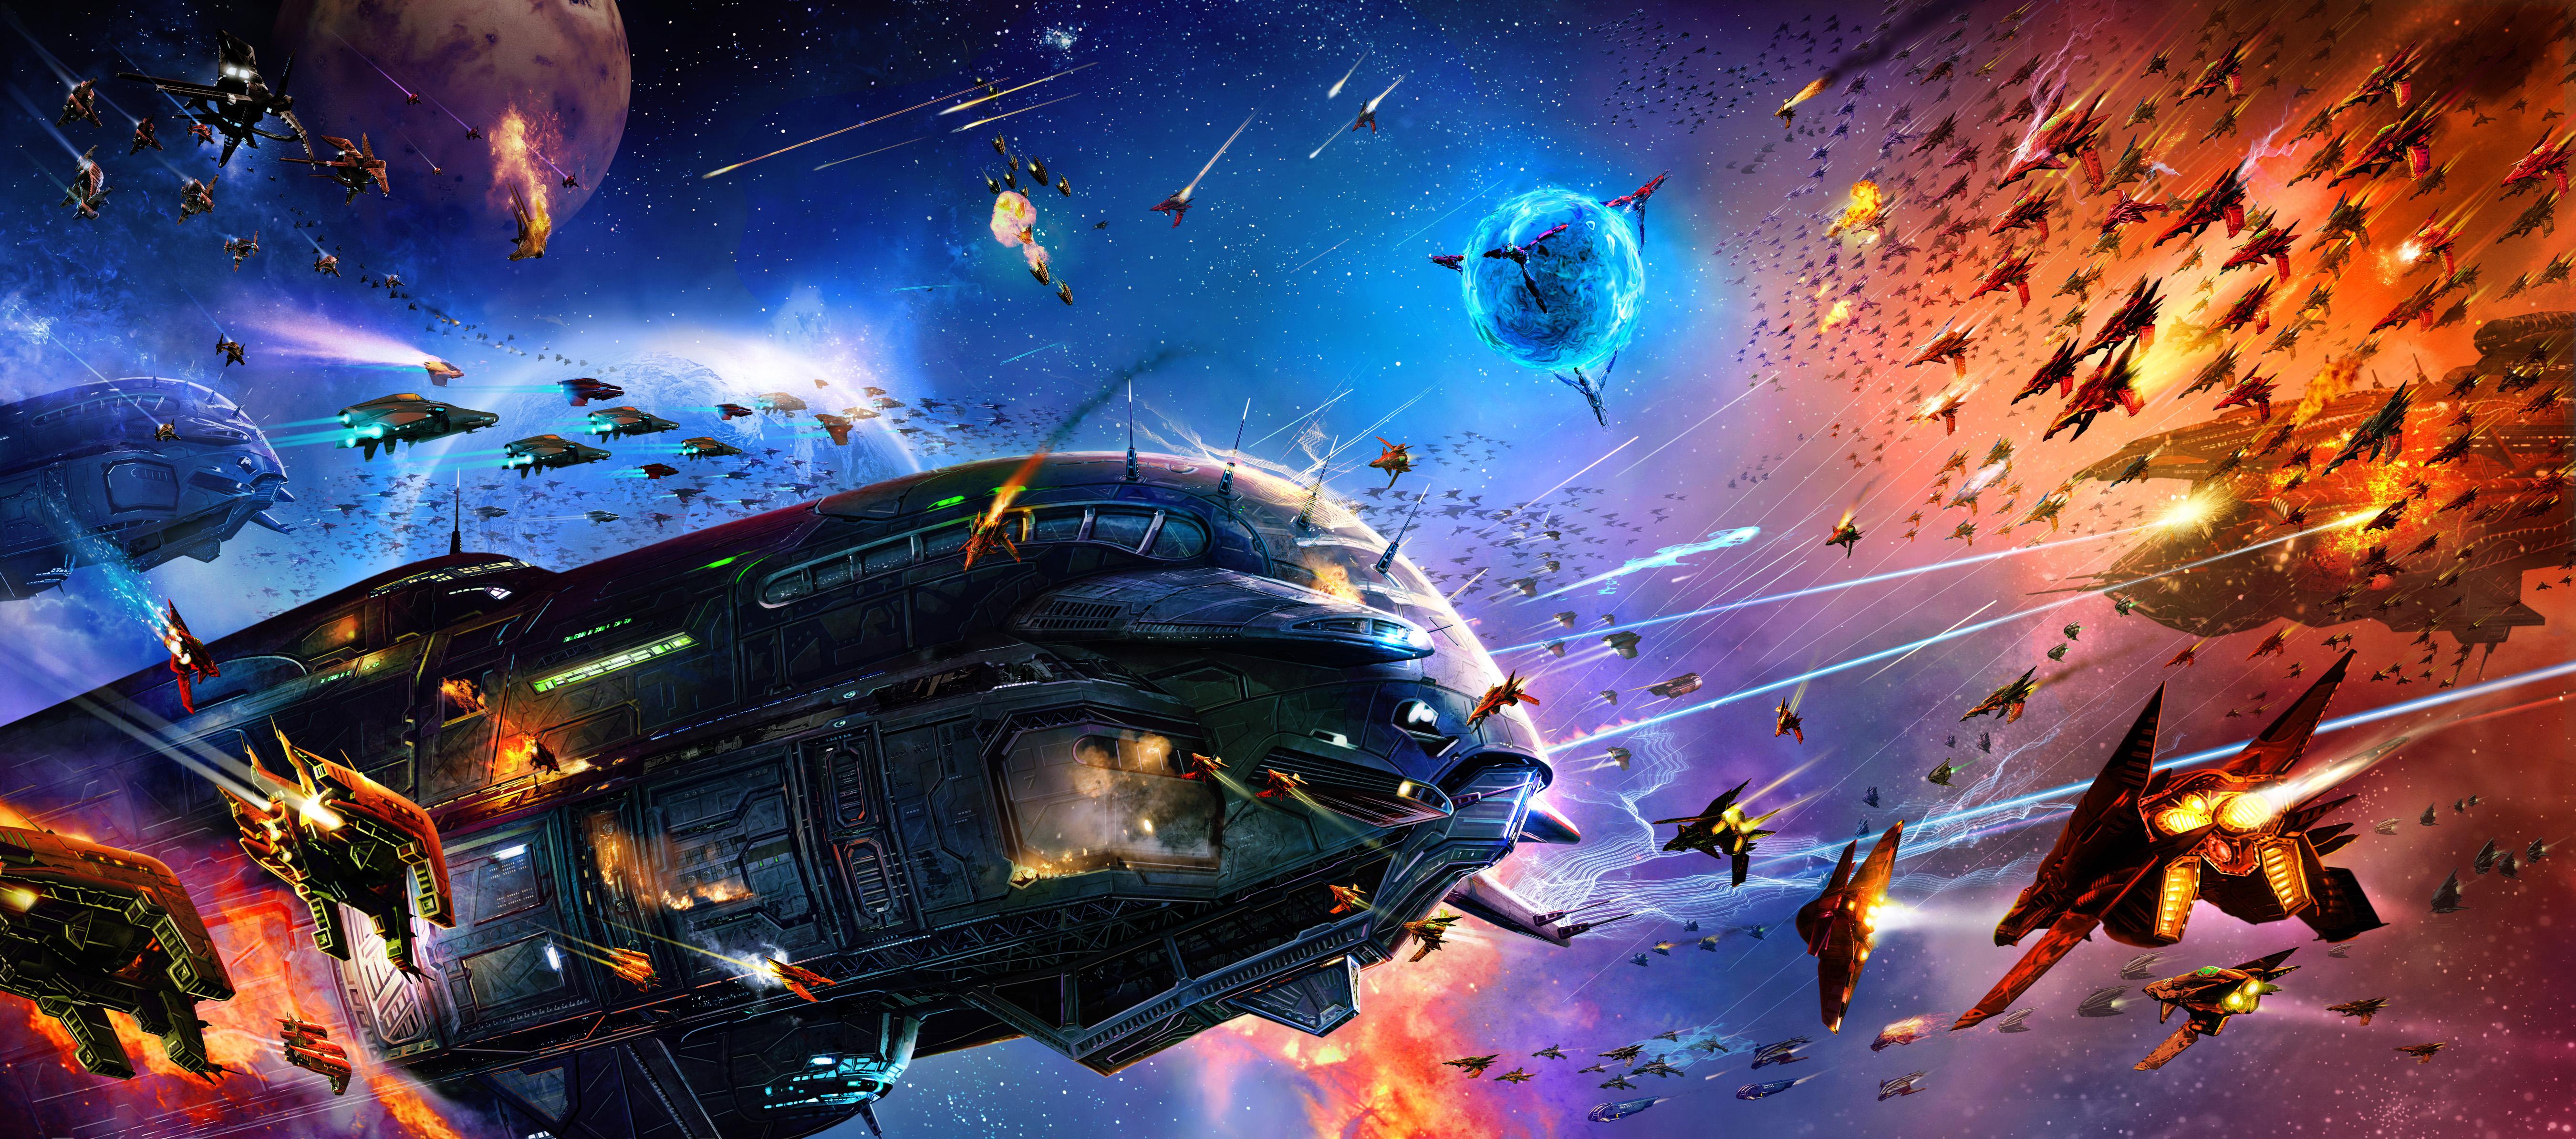 Battle 4k ultra hd wallpaper background image - Spaceship wallpaper 4k ...